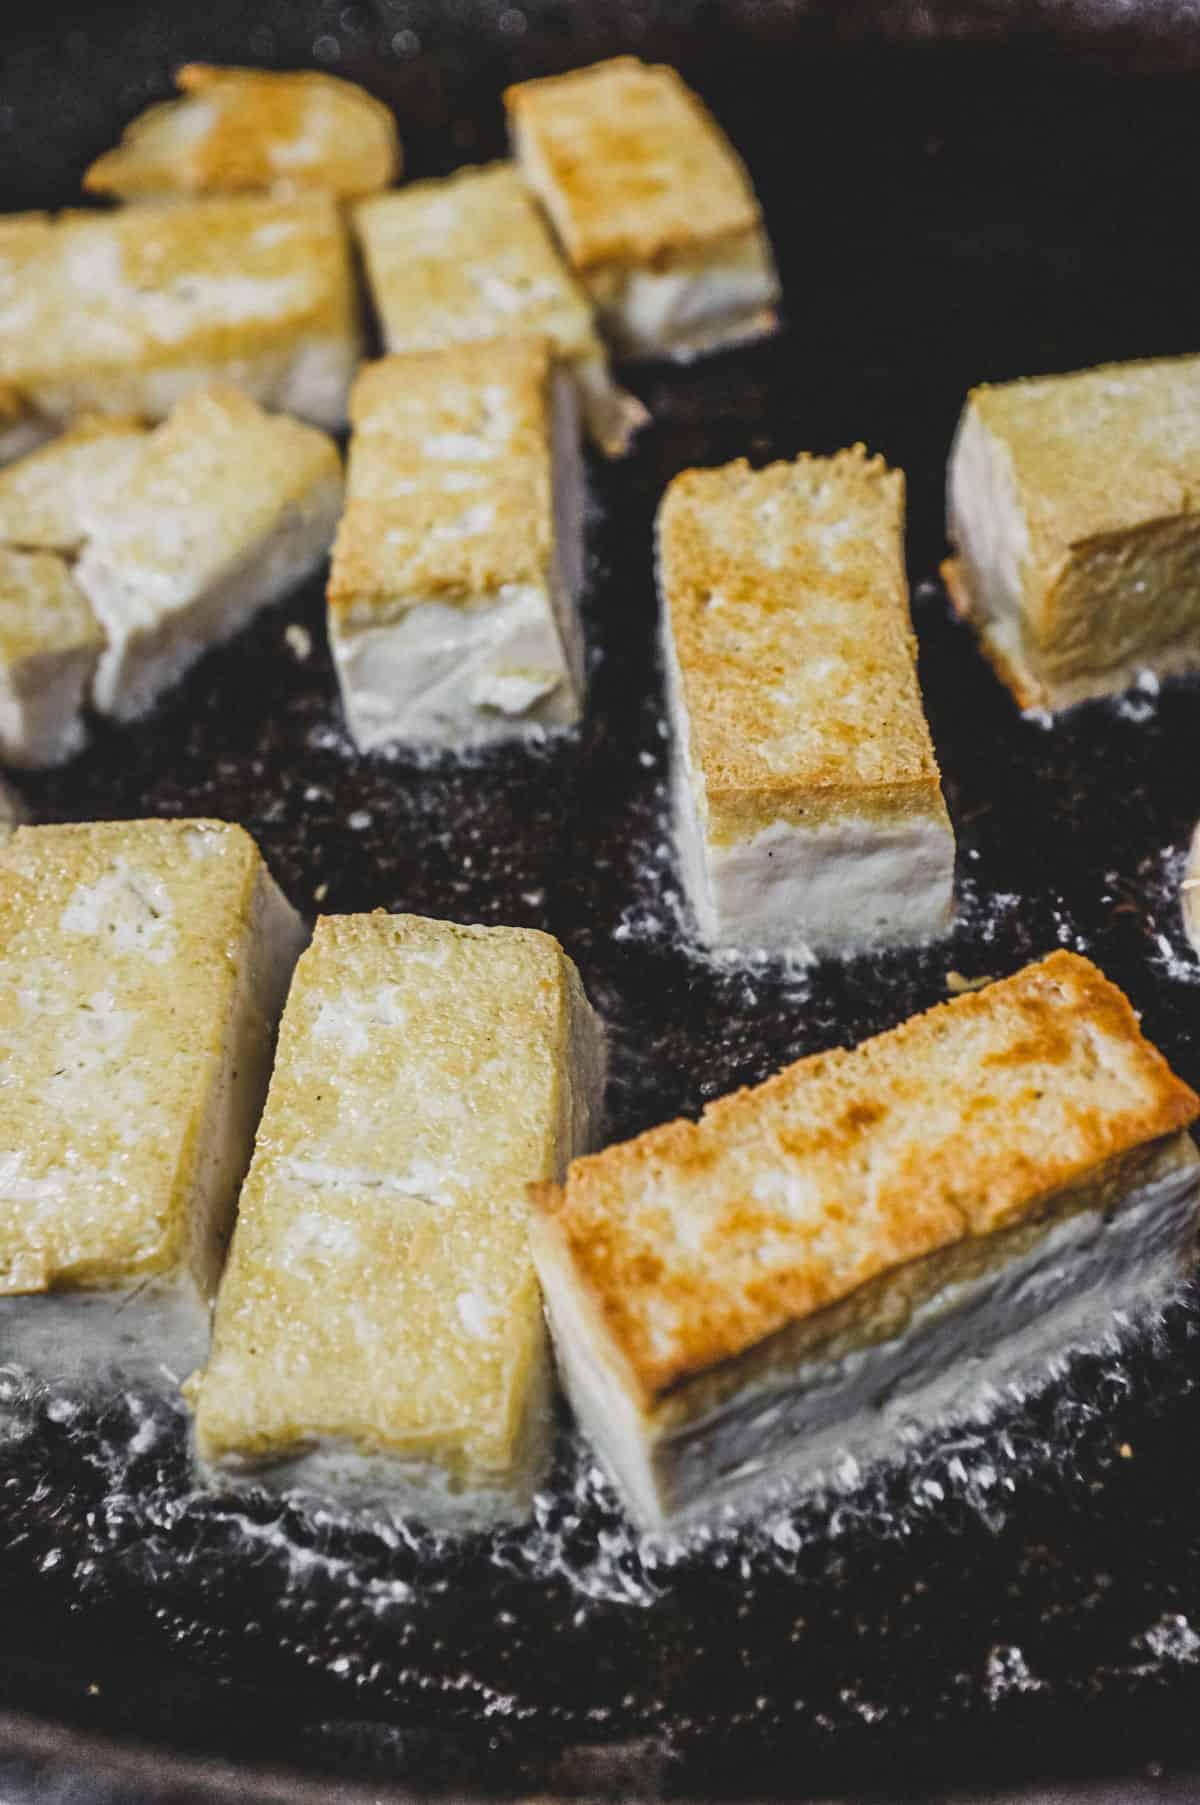 Tofu being fried in canola oil until crisp